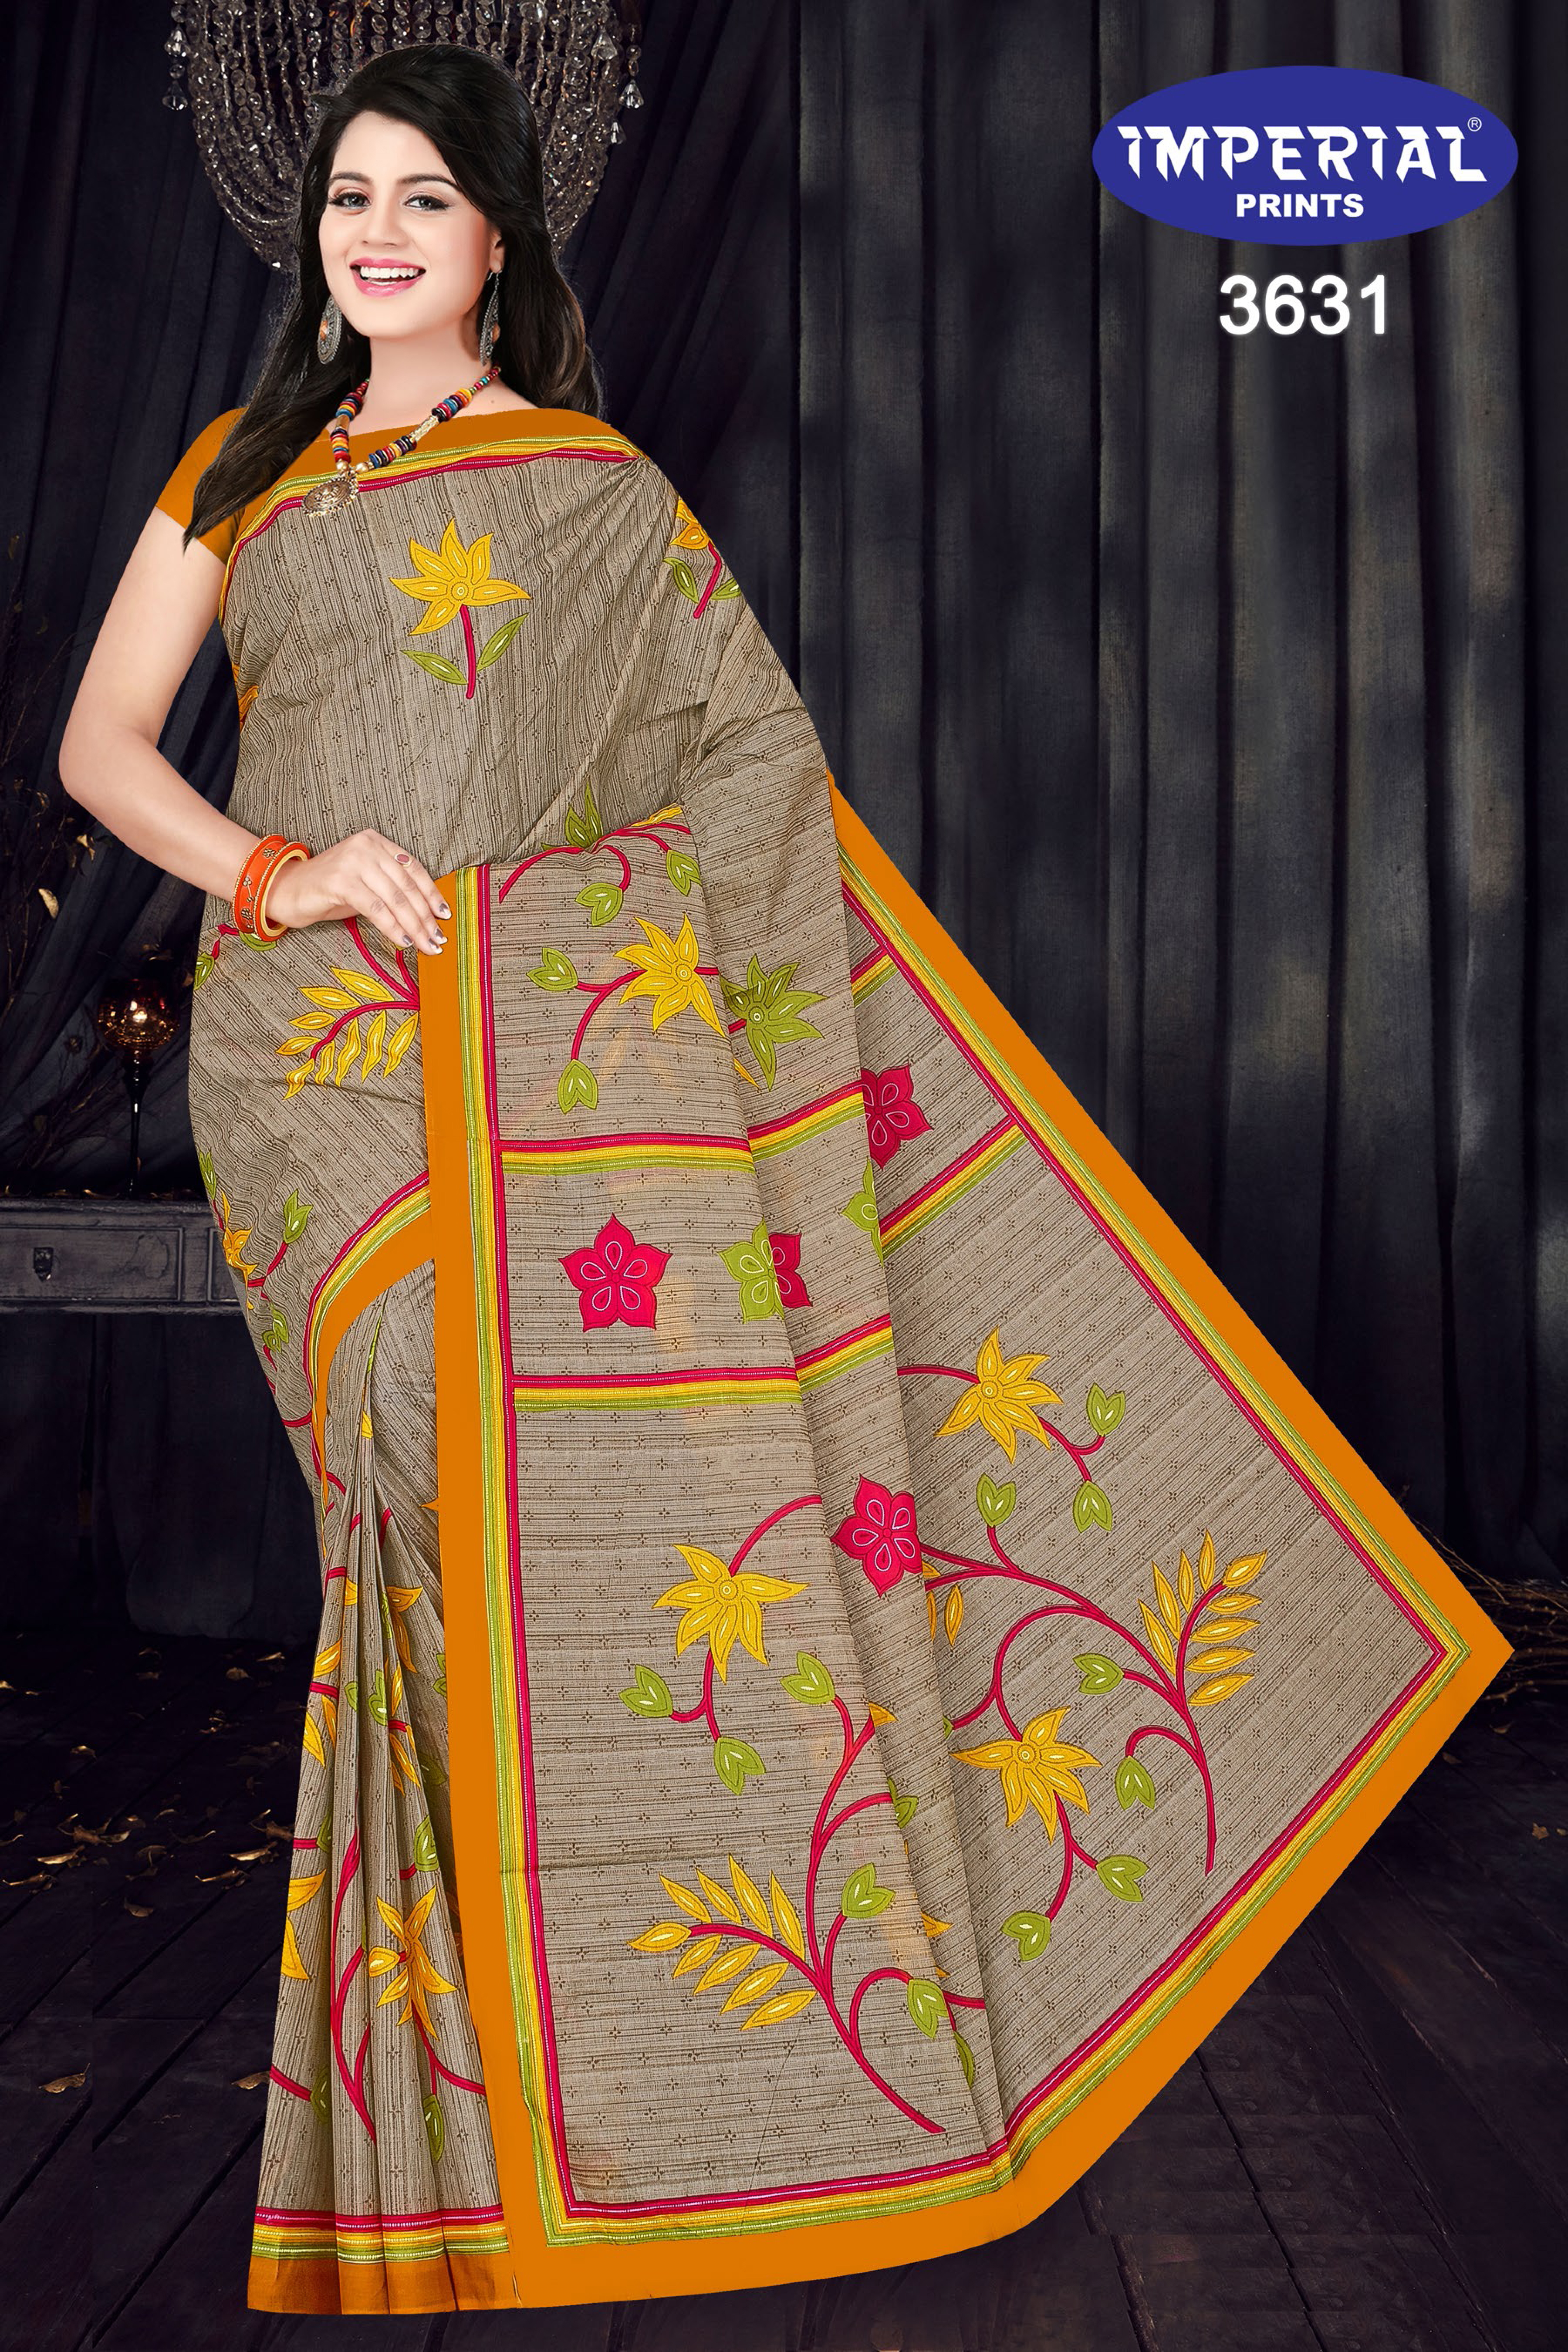 Imperial Mari Gold Saree Sari Wholesale Catalog 15 Pcs 2 - Imperial Mari Gold Saree Sari Wholesale Catalog 15 Pcs